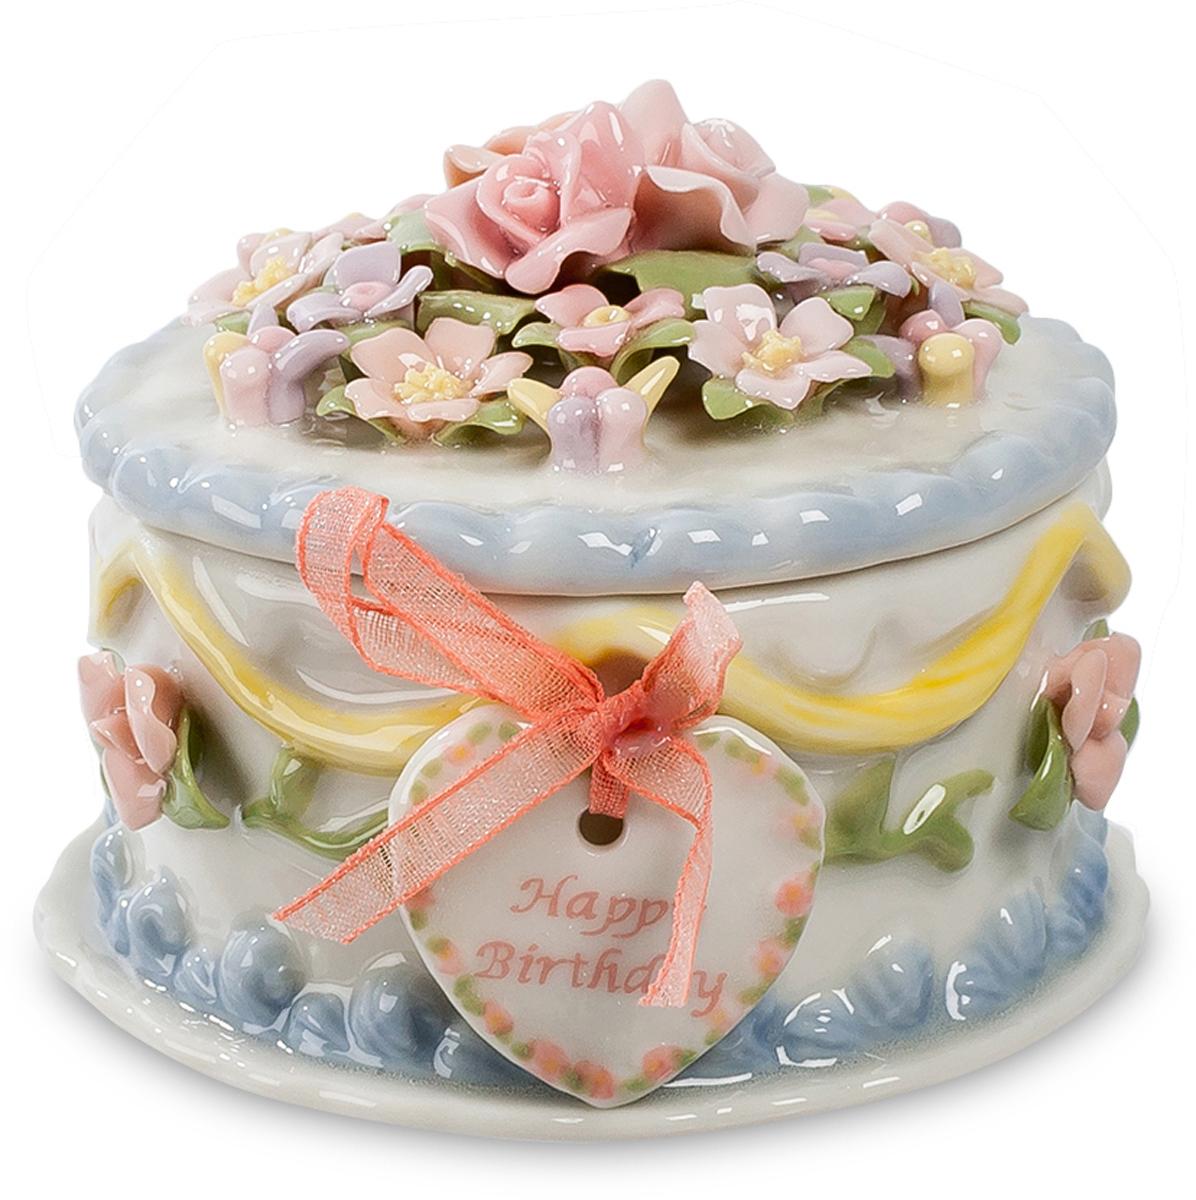 Шкатулка Pavone Праздничный торт. CMS-33/44CMS-33/44Шкатулка Праздничный торт (Pavone)